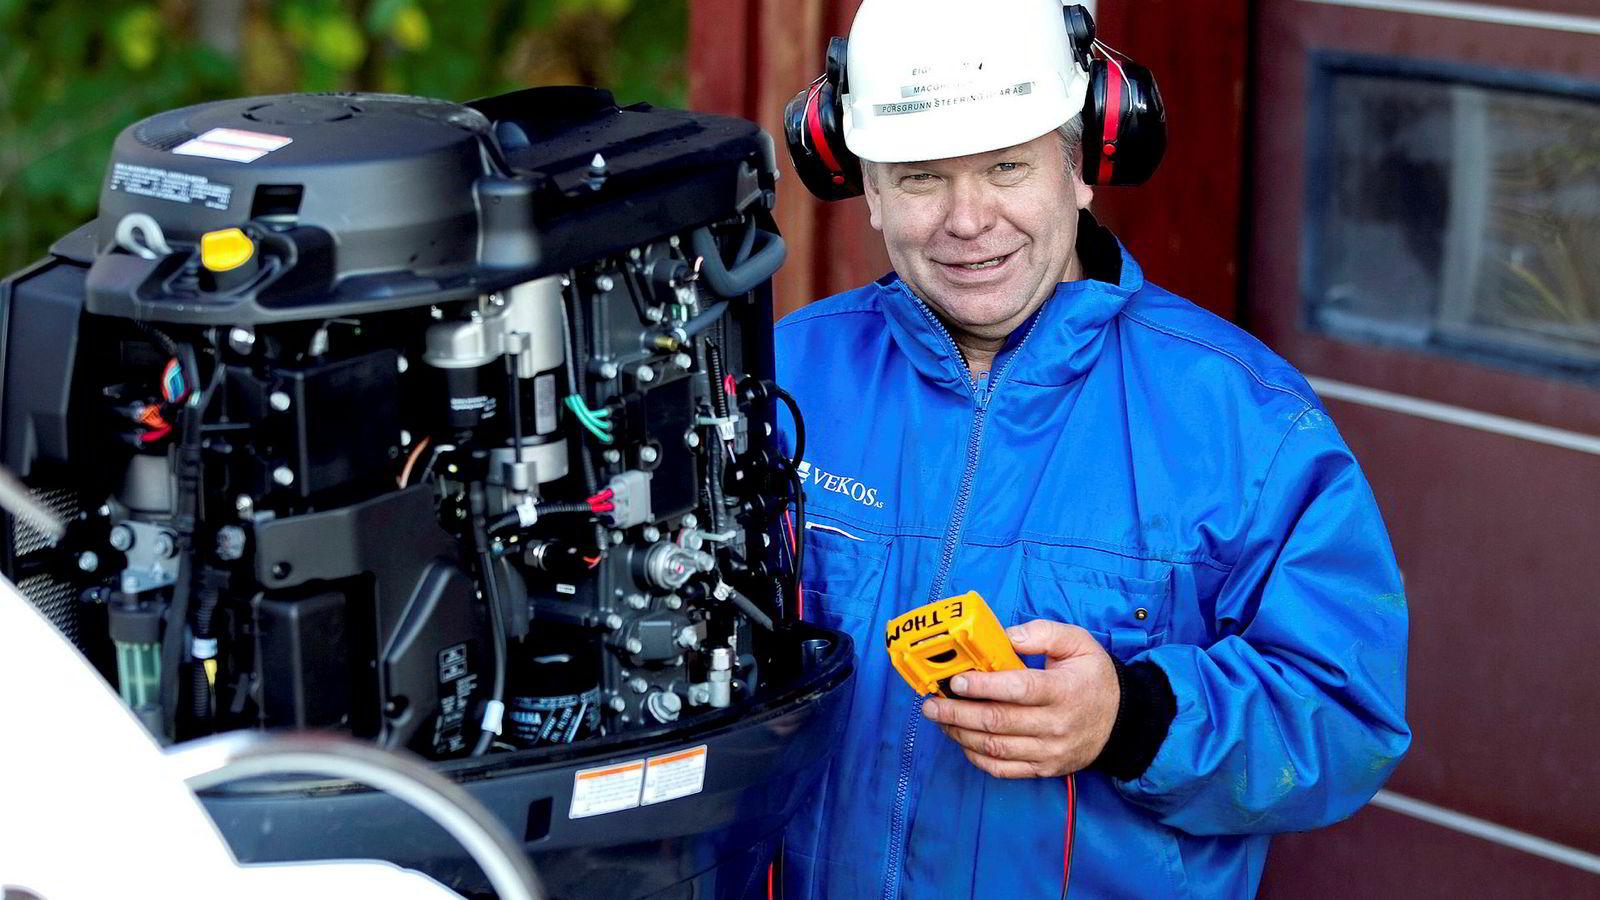 Skipselektriker Eigel Ingvar Thom har i 2018 fått en papirgevinst på rundt 16 millioner kroner for sine to investeringer på Oslo Børs.